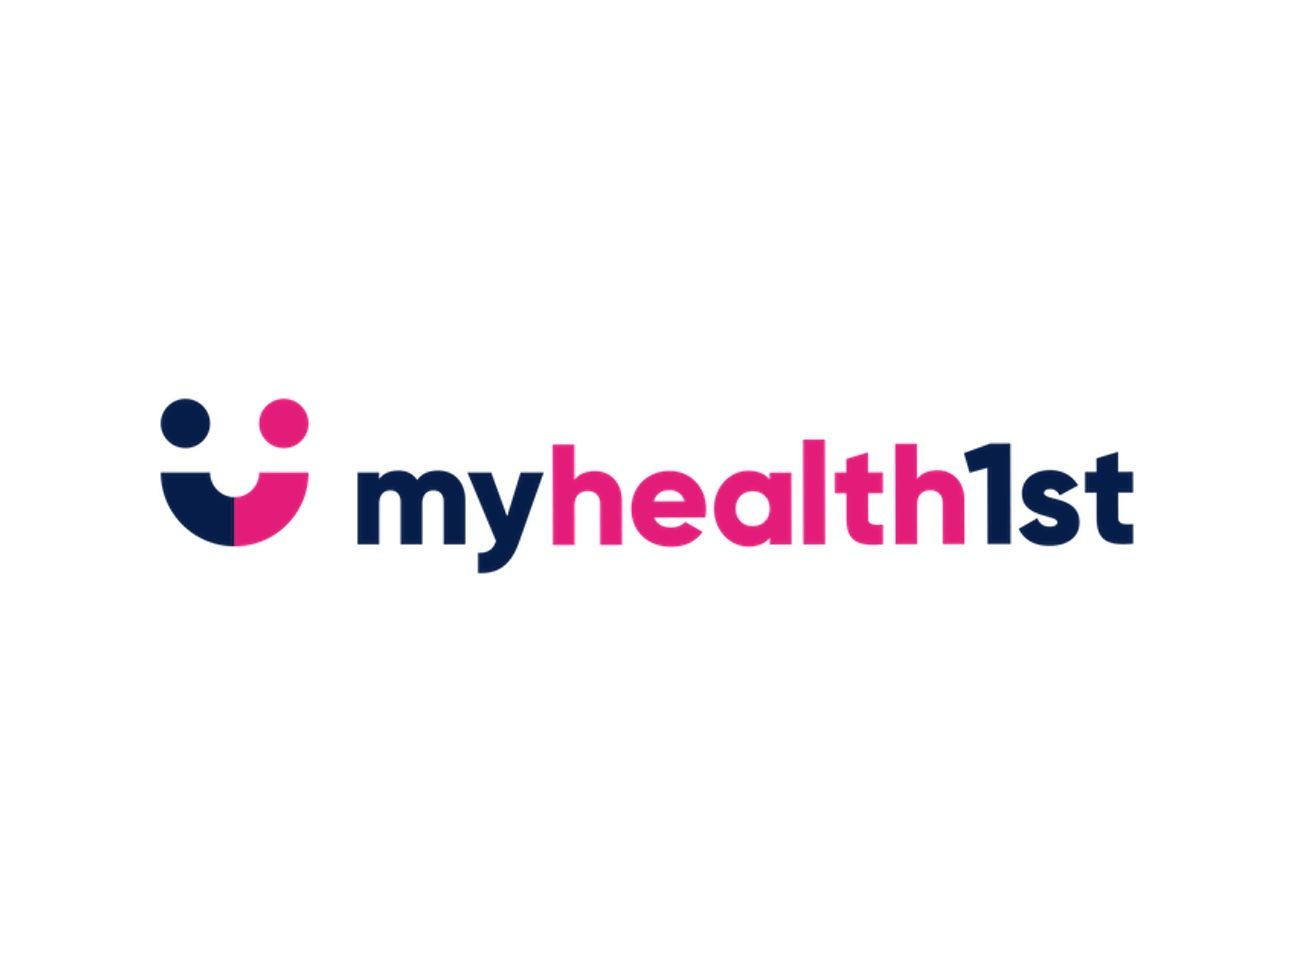 Myhealth1st